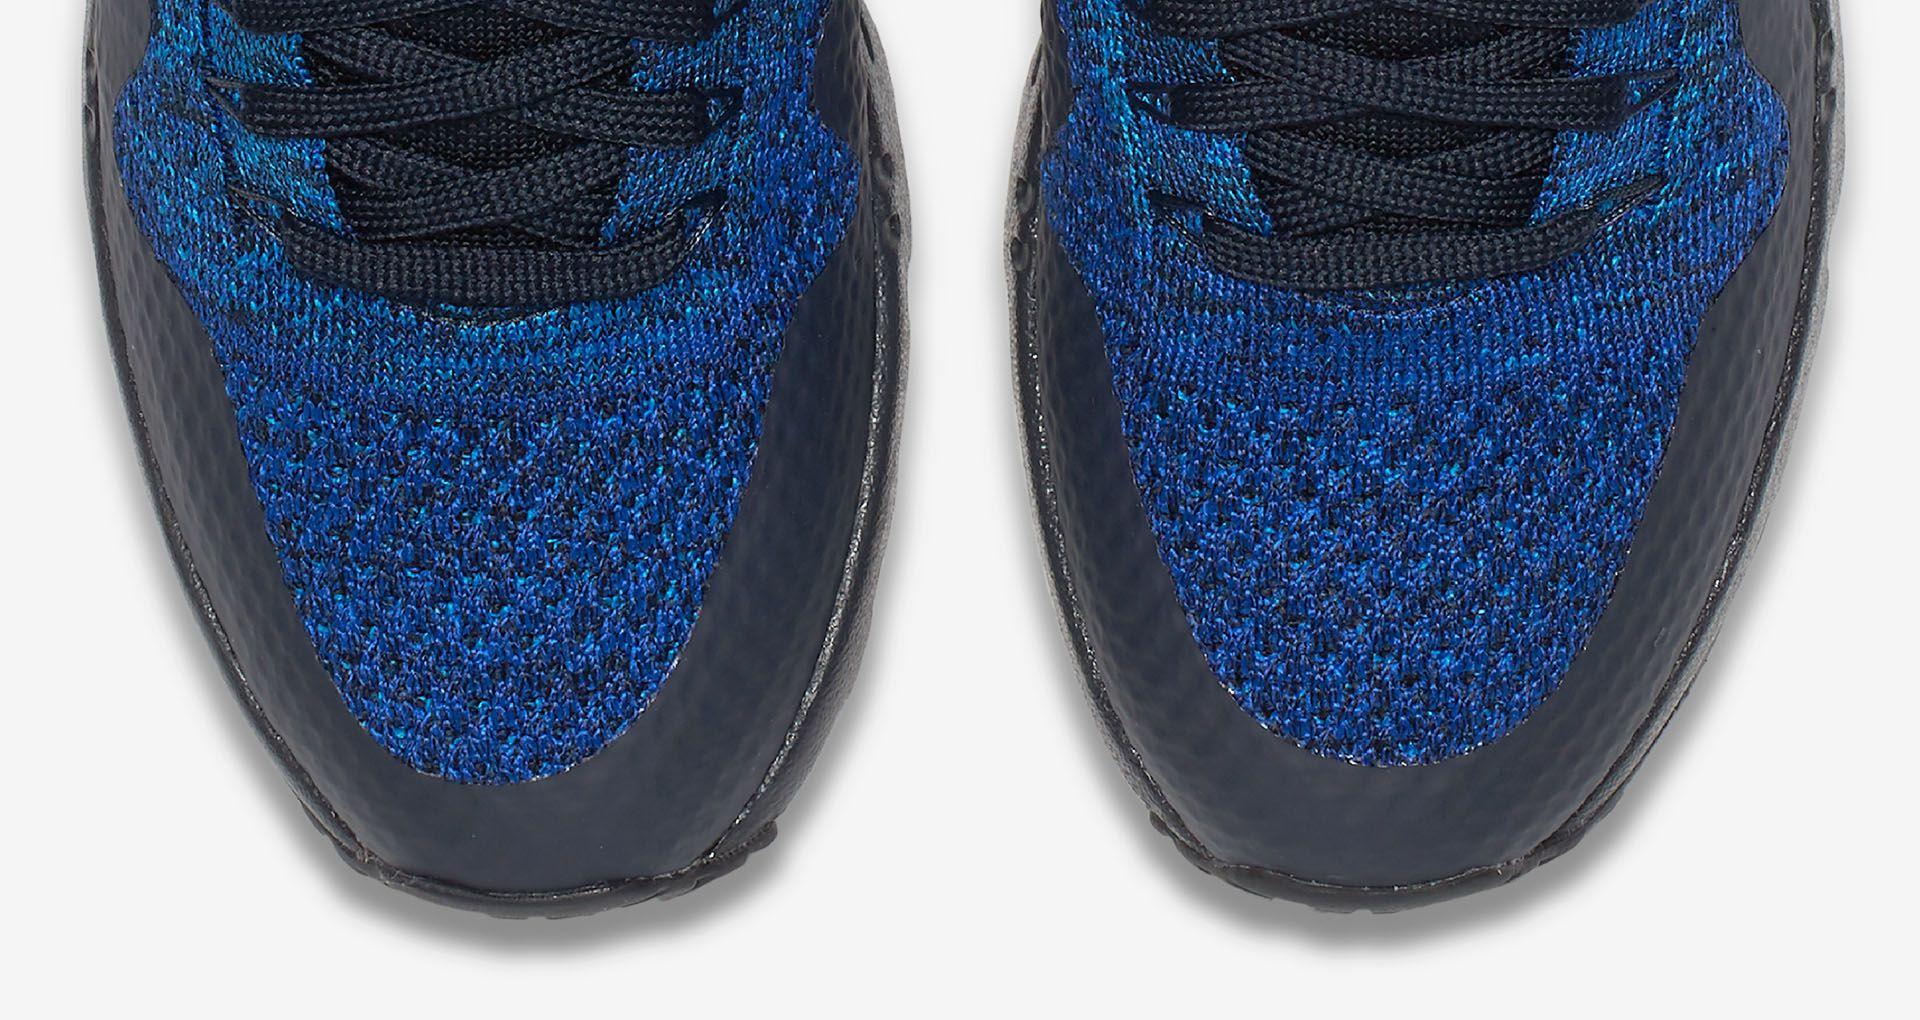 promo code 7ab3e de373 AIR MORE UPTEMPO. National Air  Women s Nike Air Max 1 Ultra Flyknit  Racer  Blue